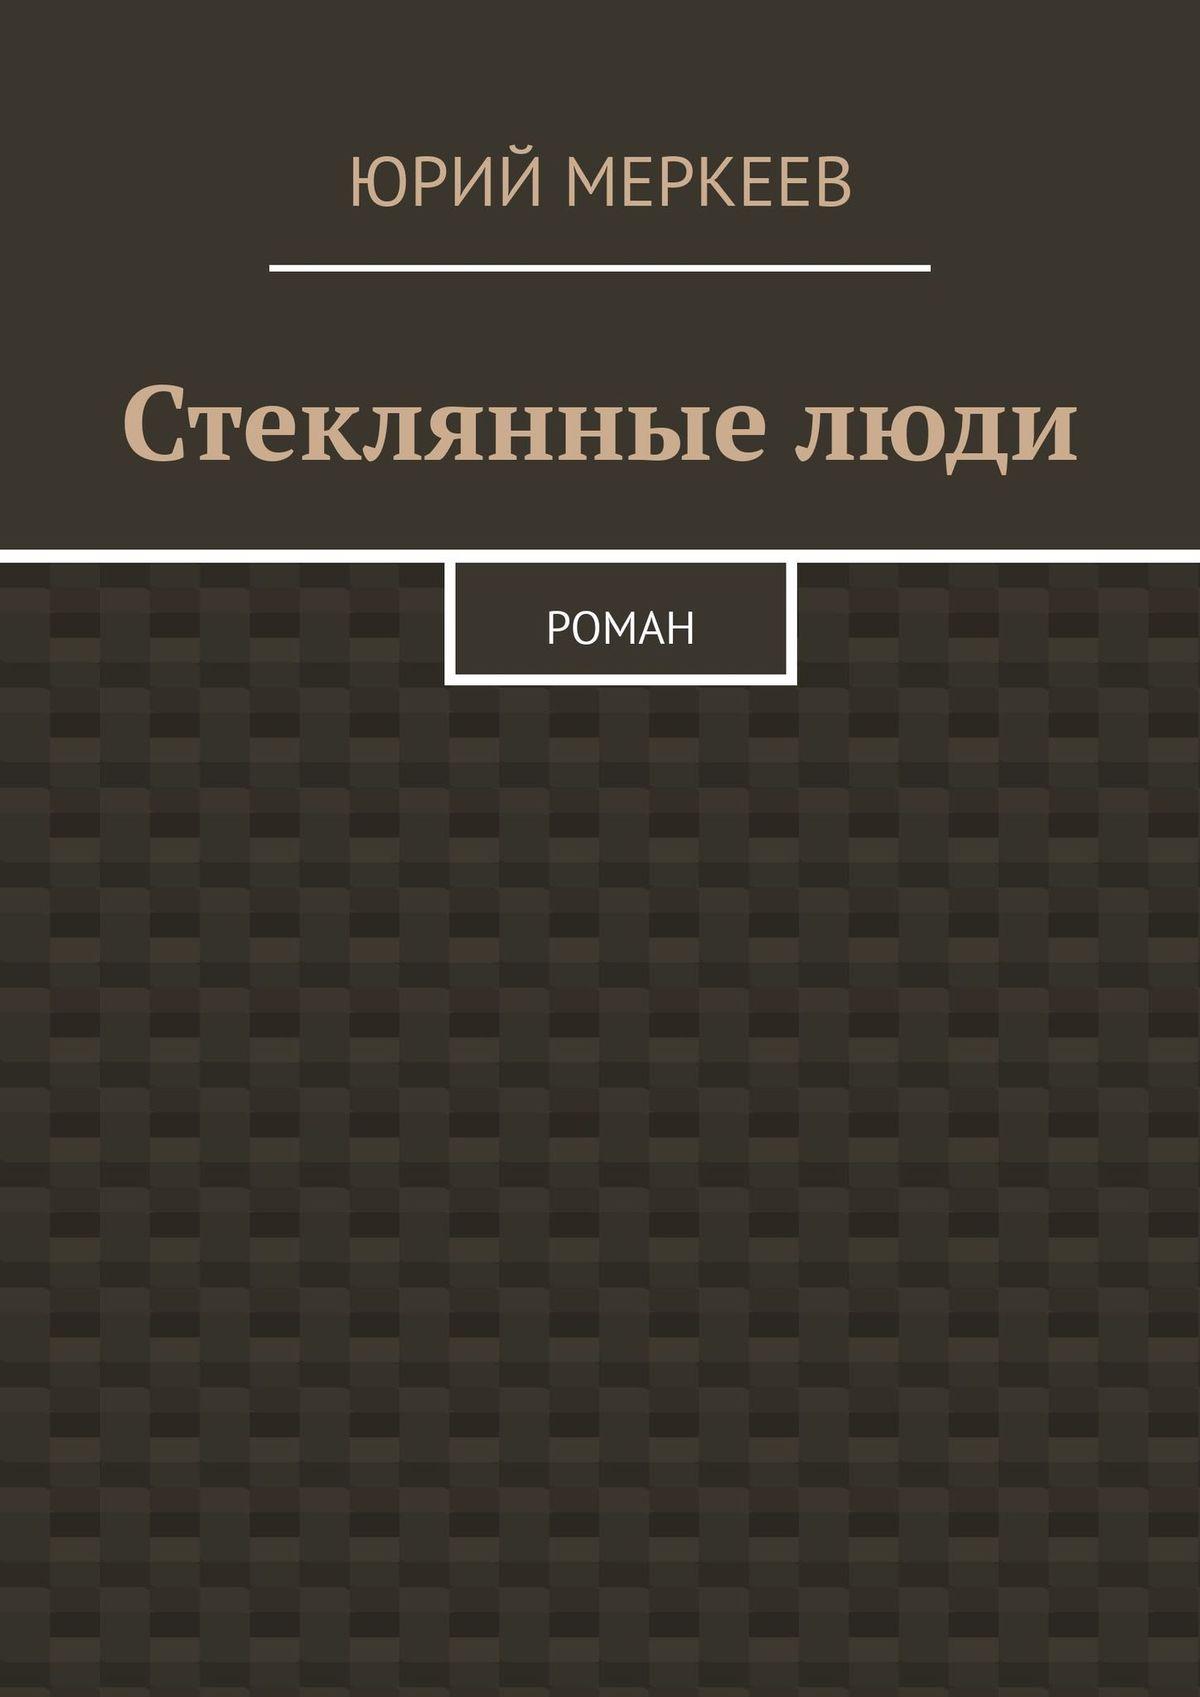 Фото - Юрий Меркеев Стеклянныелюди. Роман юрий меркеев монастырь икошка